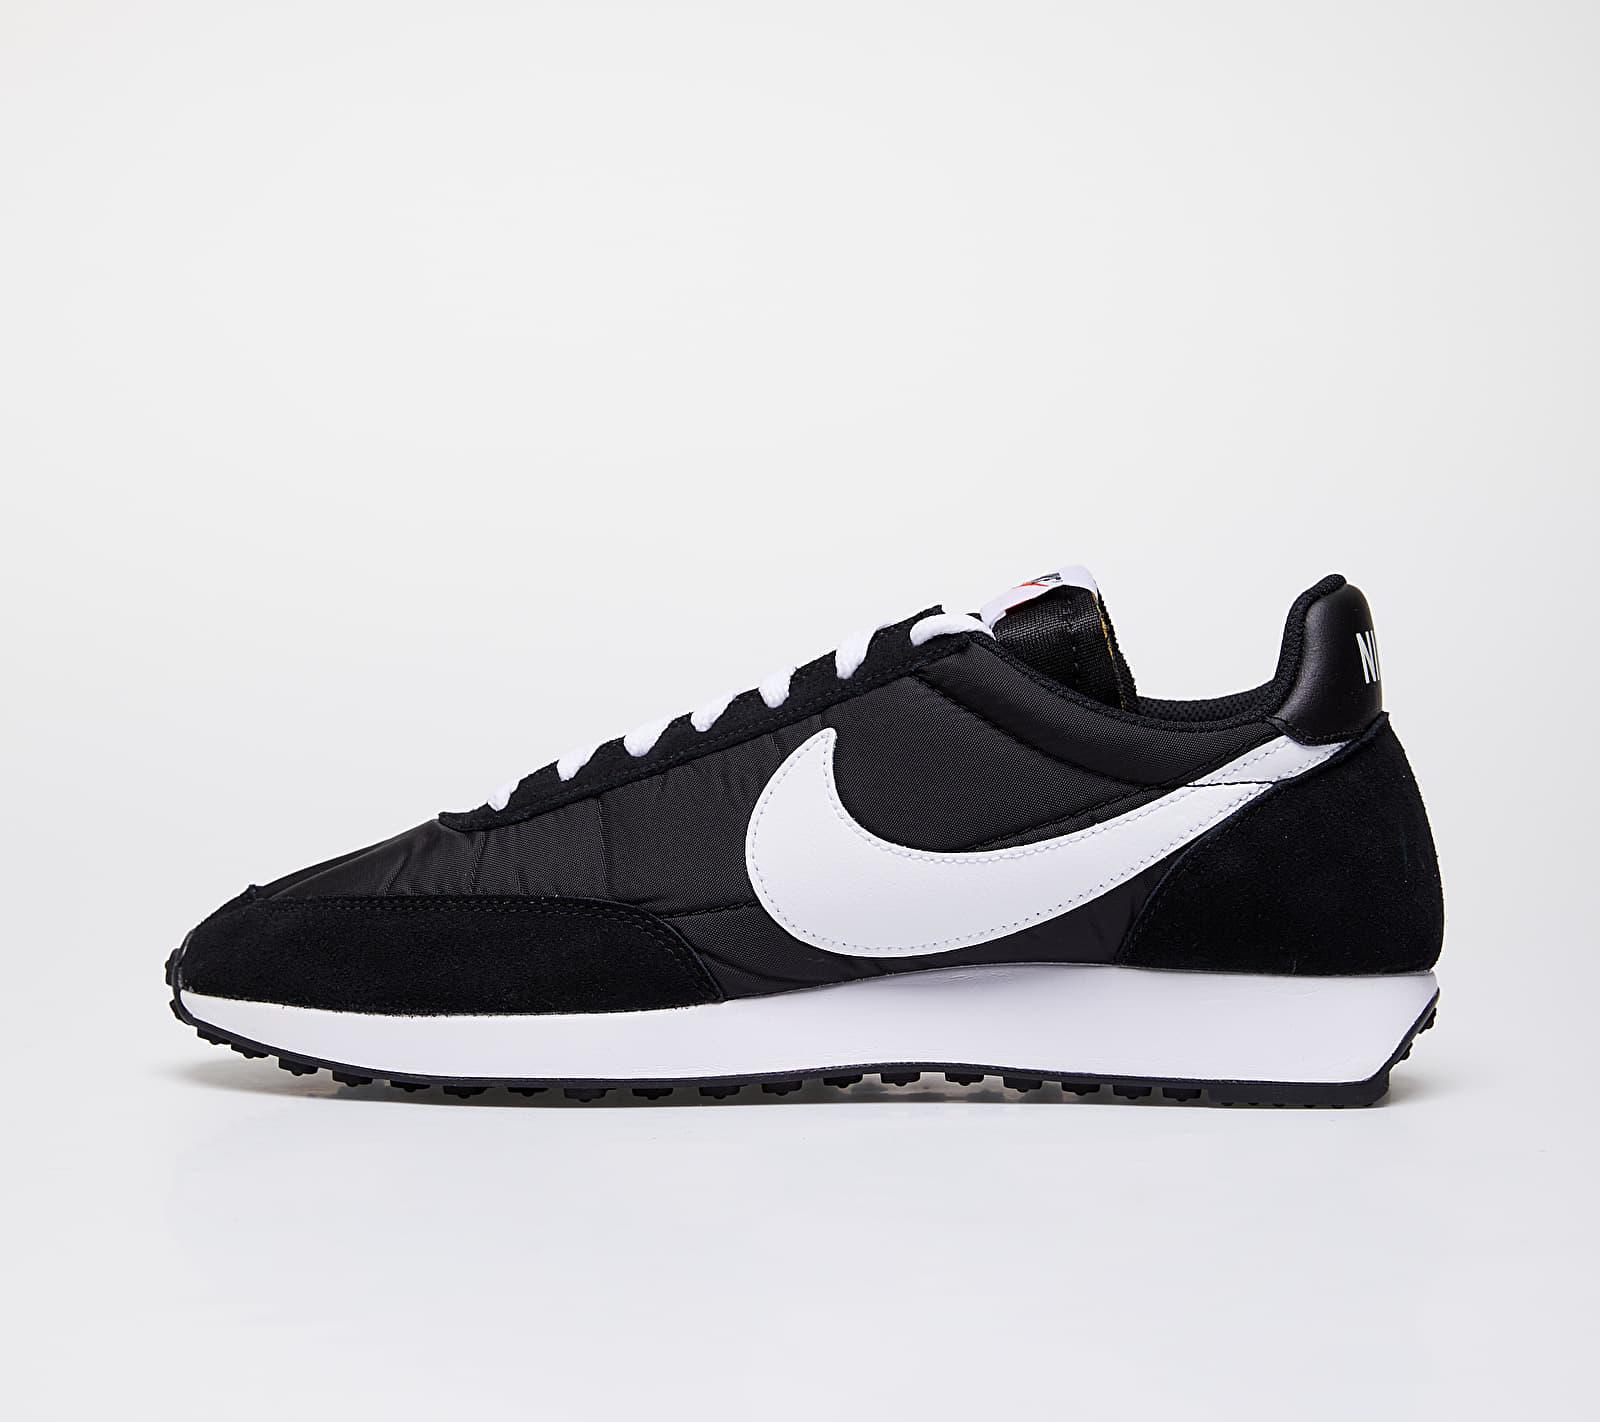 Nike Air Tailwind 79 Black/ White-Team Orange 487754-012